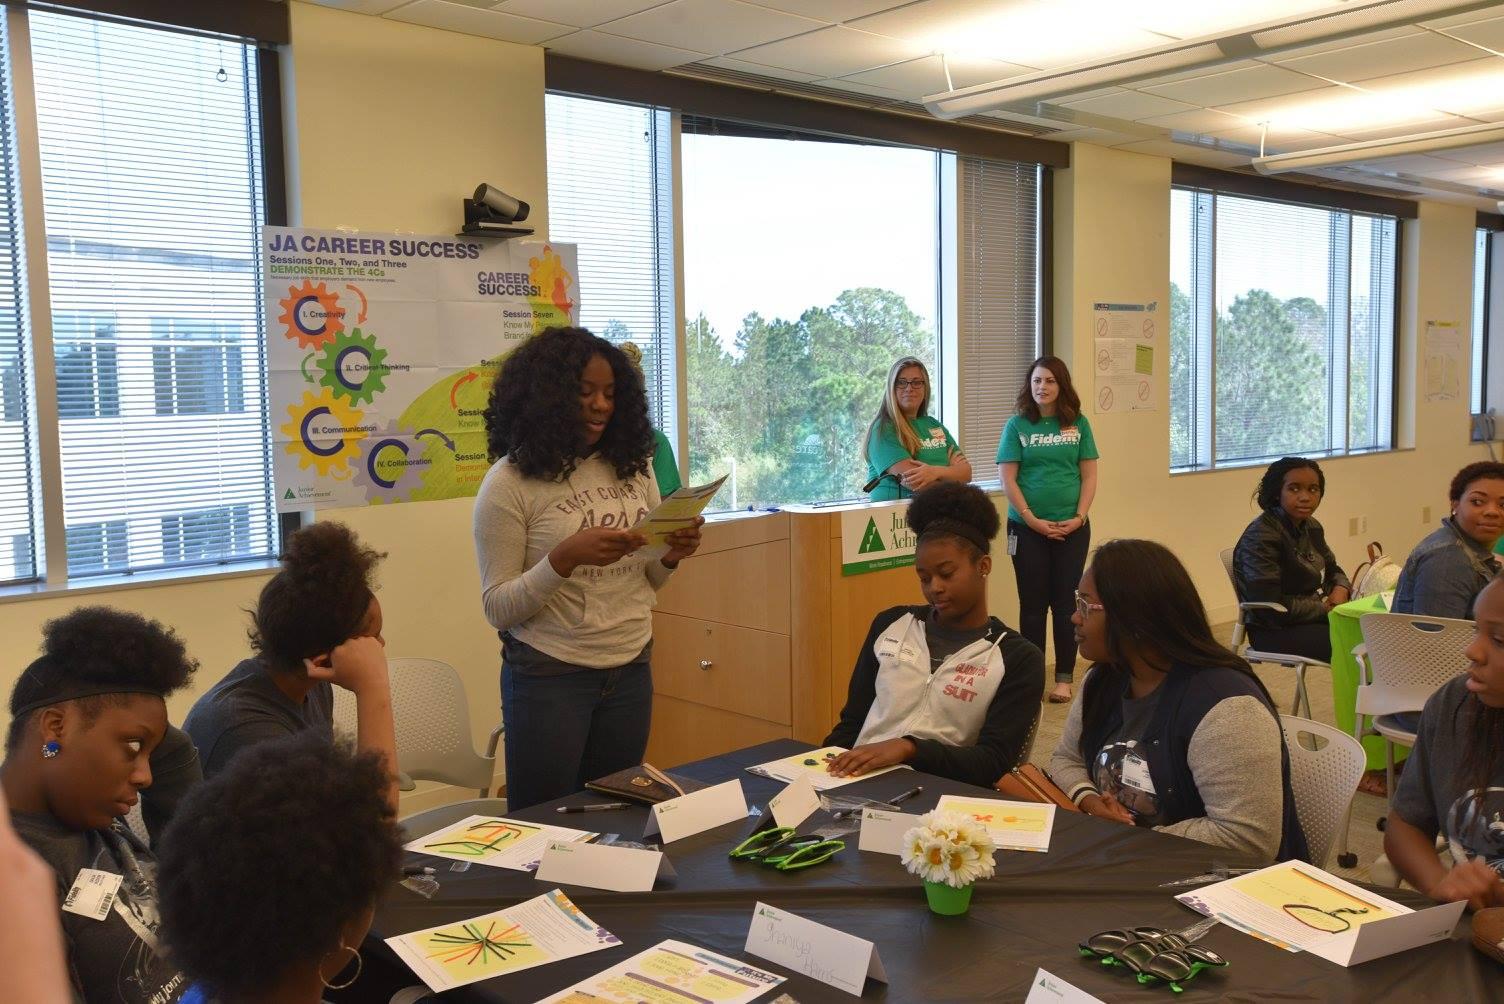 Fidelity Investments women inspire JA Girl$ participants